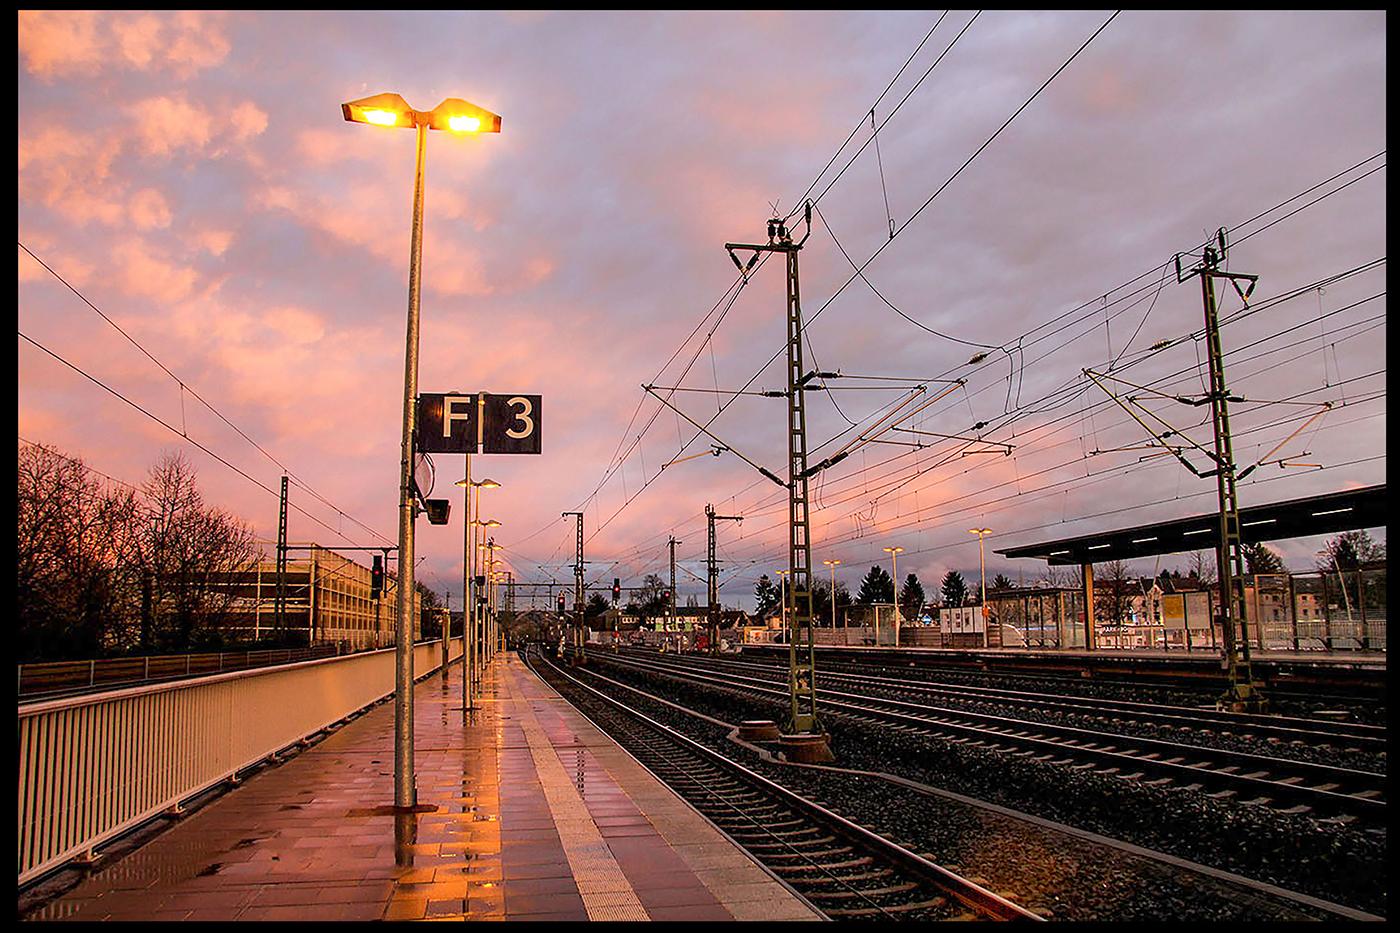 14. Platz: Siegburg, Bahnhof | © Dr. Doris Nsiff